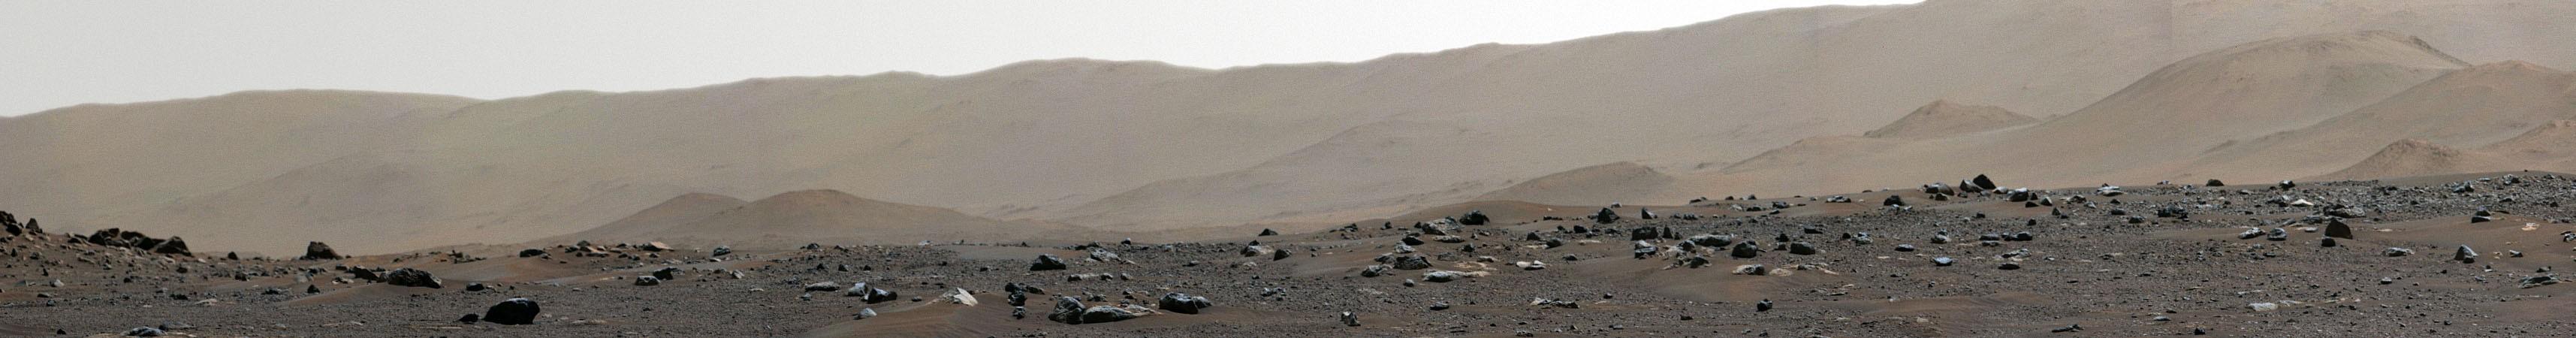 Rand des Jezero-Kraters auf dem Mars